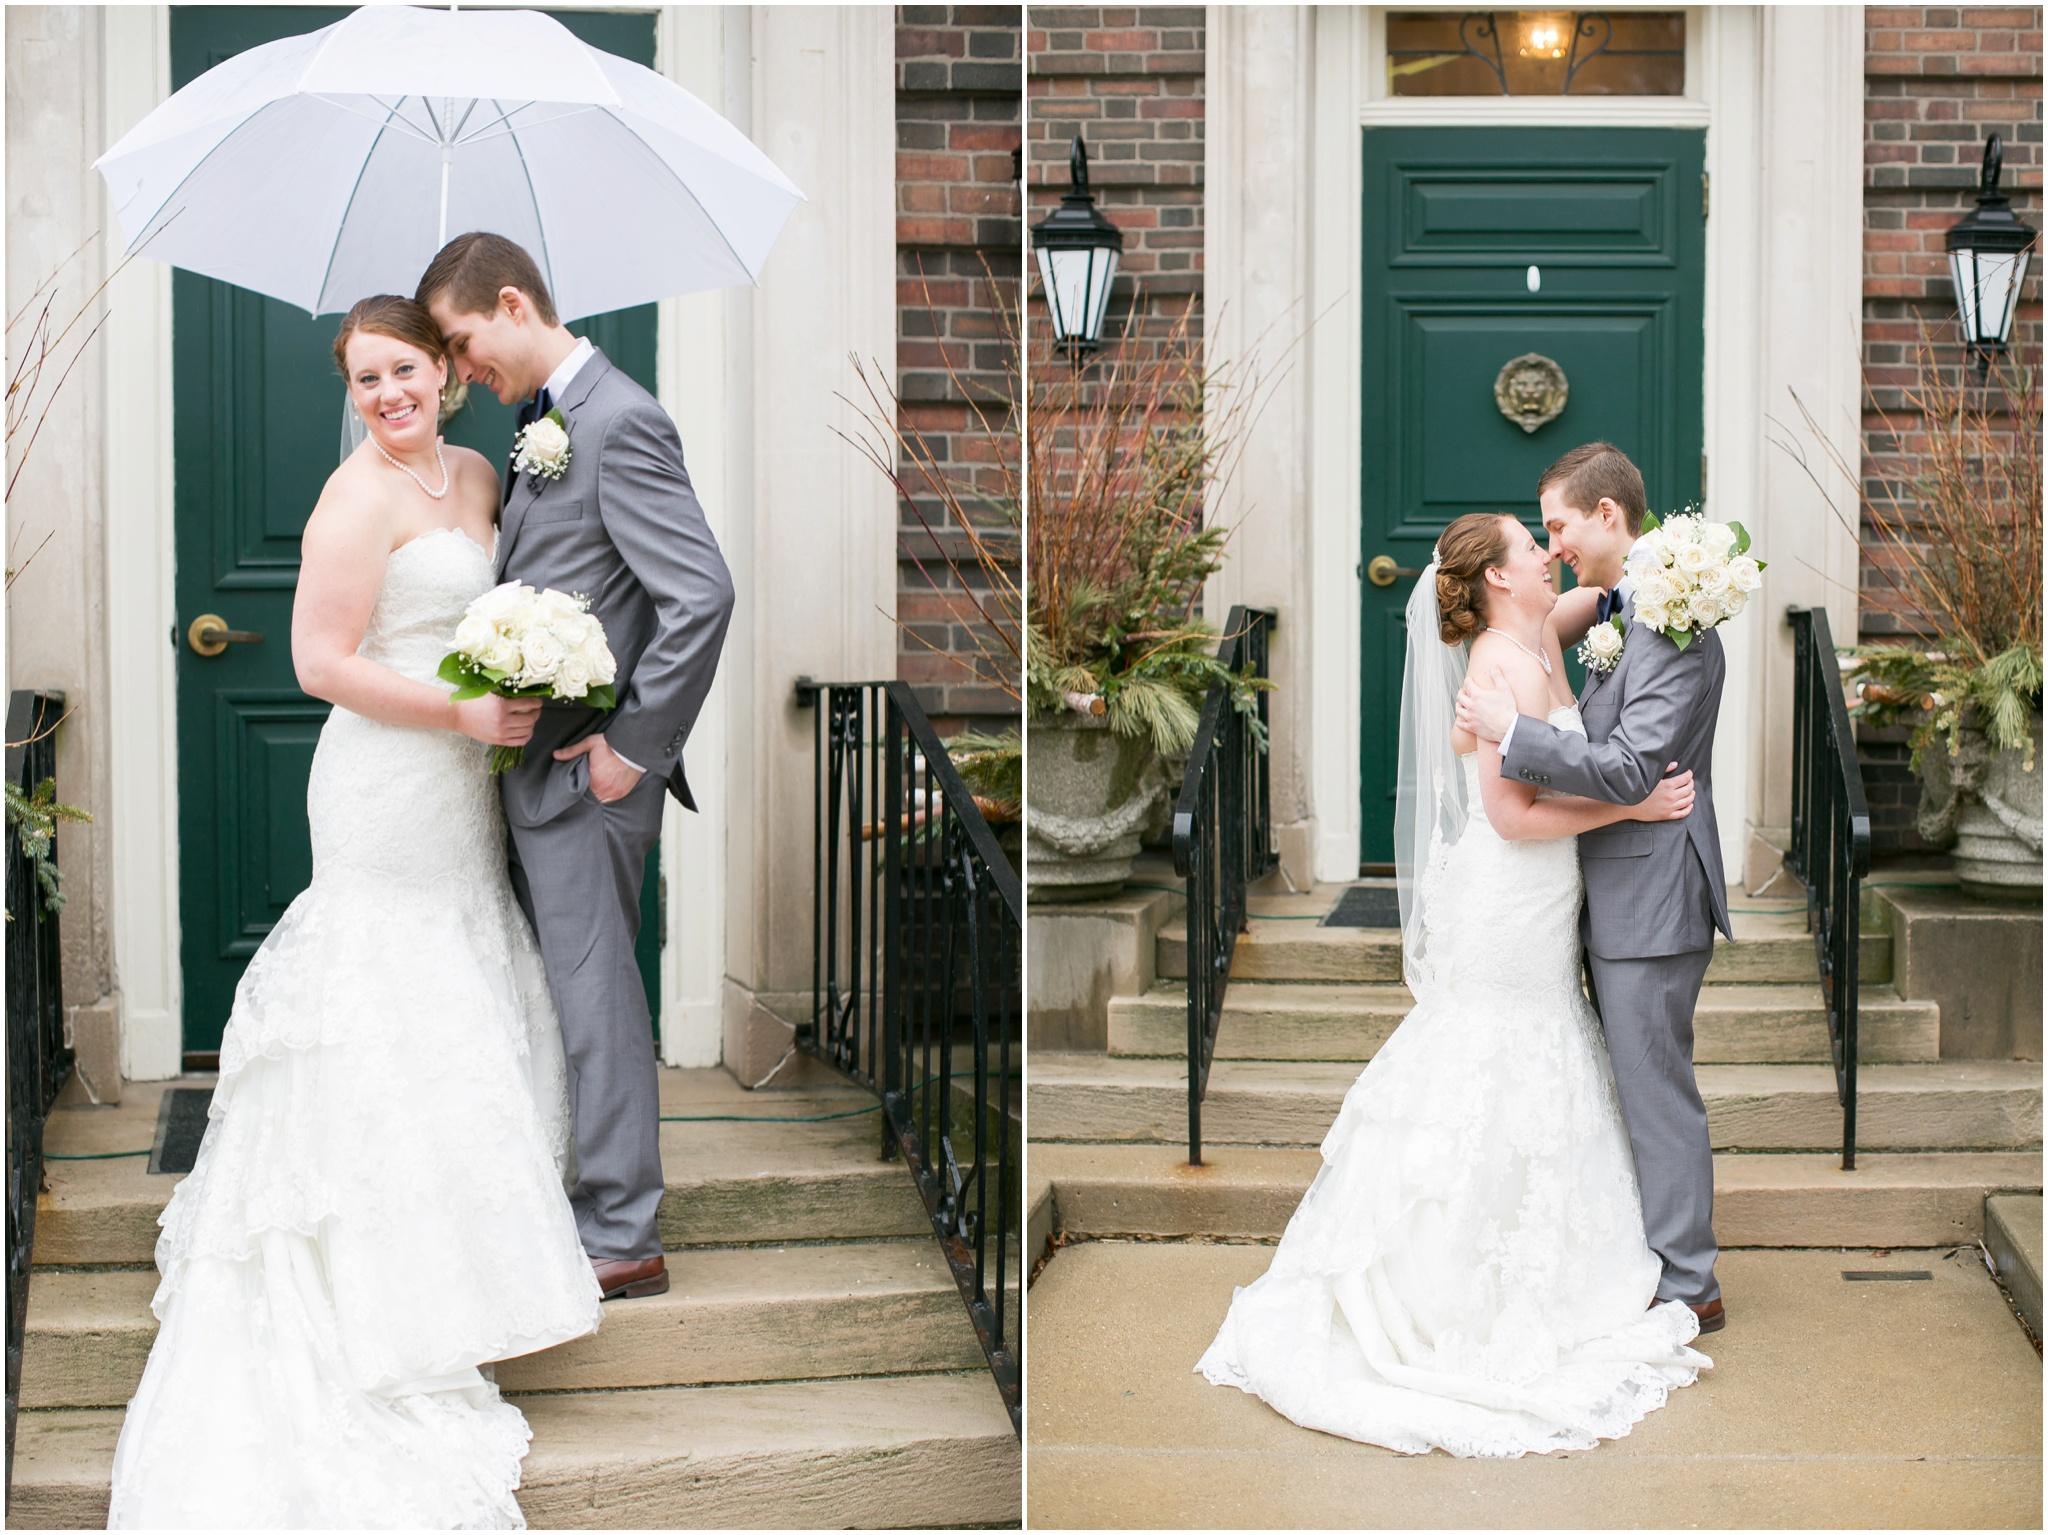 Madison_Club_Madison_Wisconsin_Wedding_Photographer_Spring_Rainy_Wedding_2615.jpg